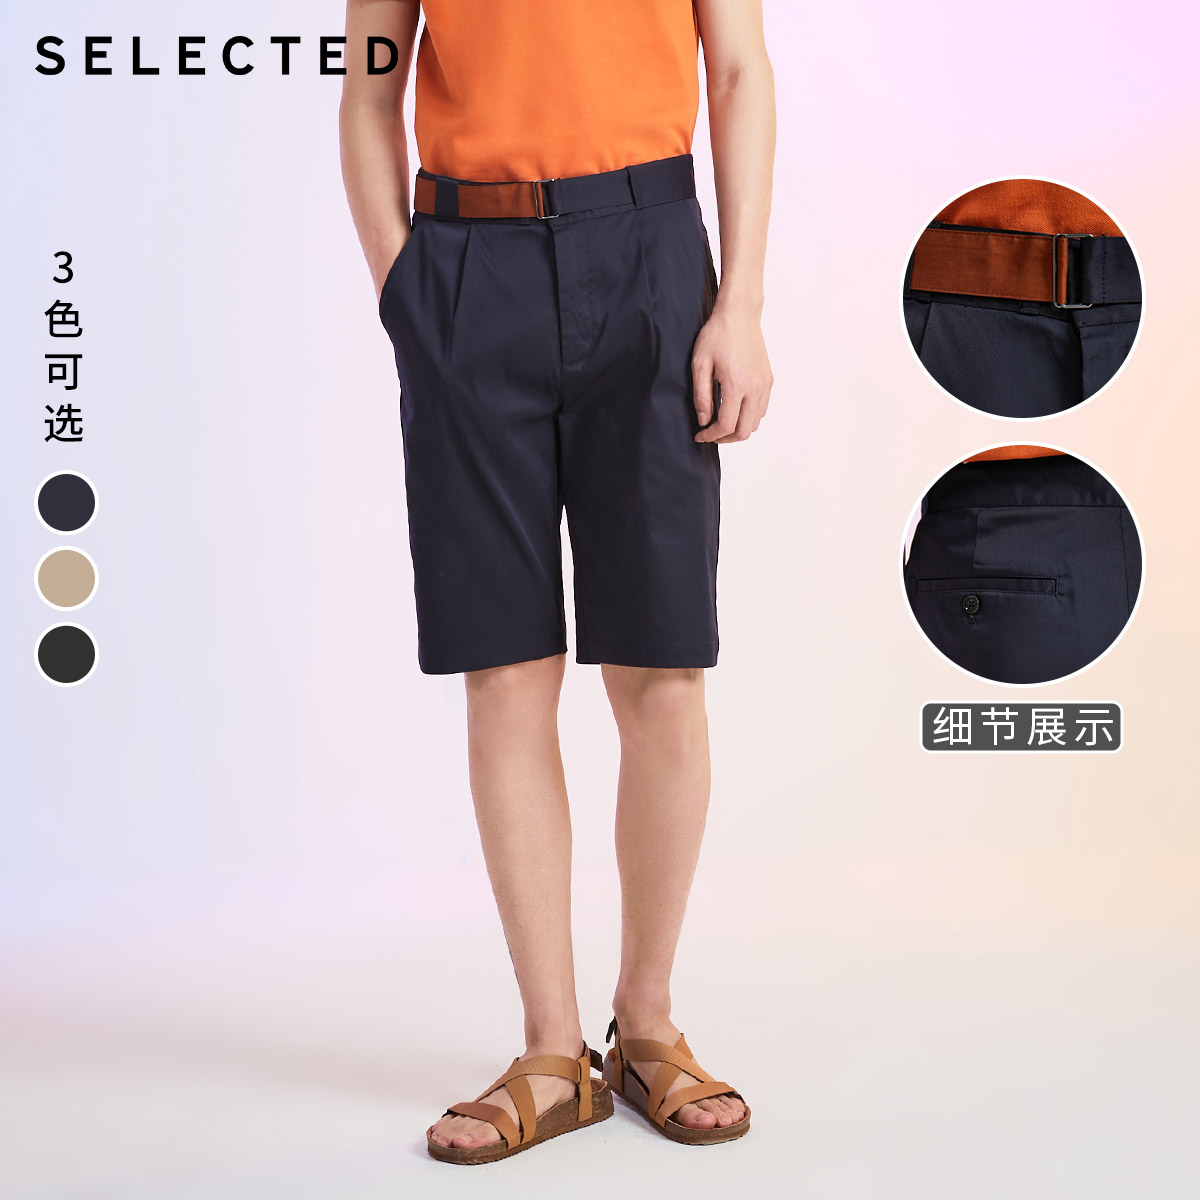 SELECTED Men's Loose Fit Waist Belt Assorted Colors Shorts LAB 4202SH519